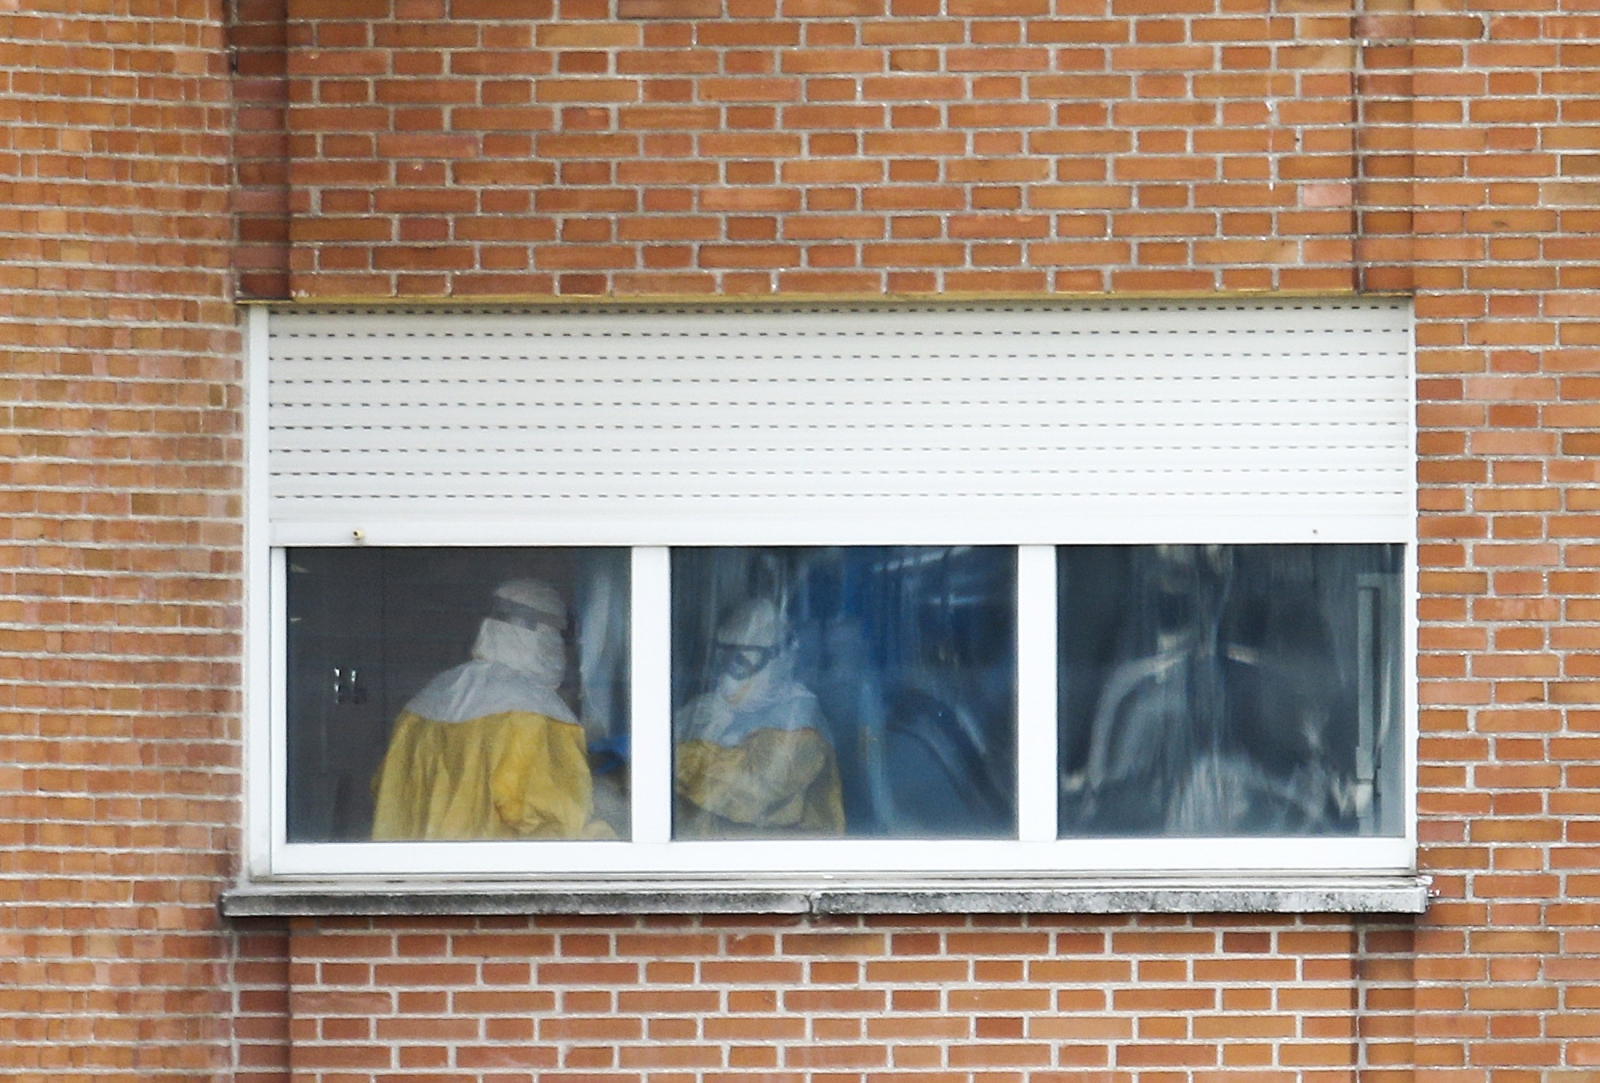 Activity in Madrid Hospital's Ebola Unit under Close Scrutiny